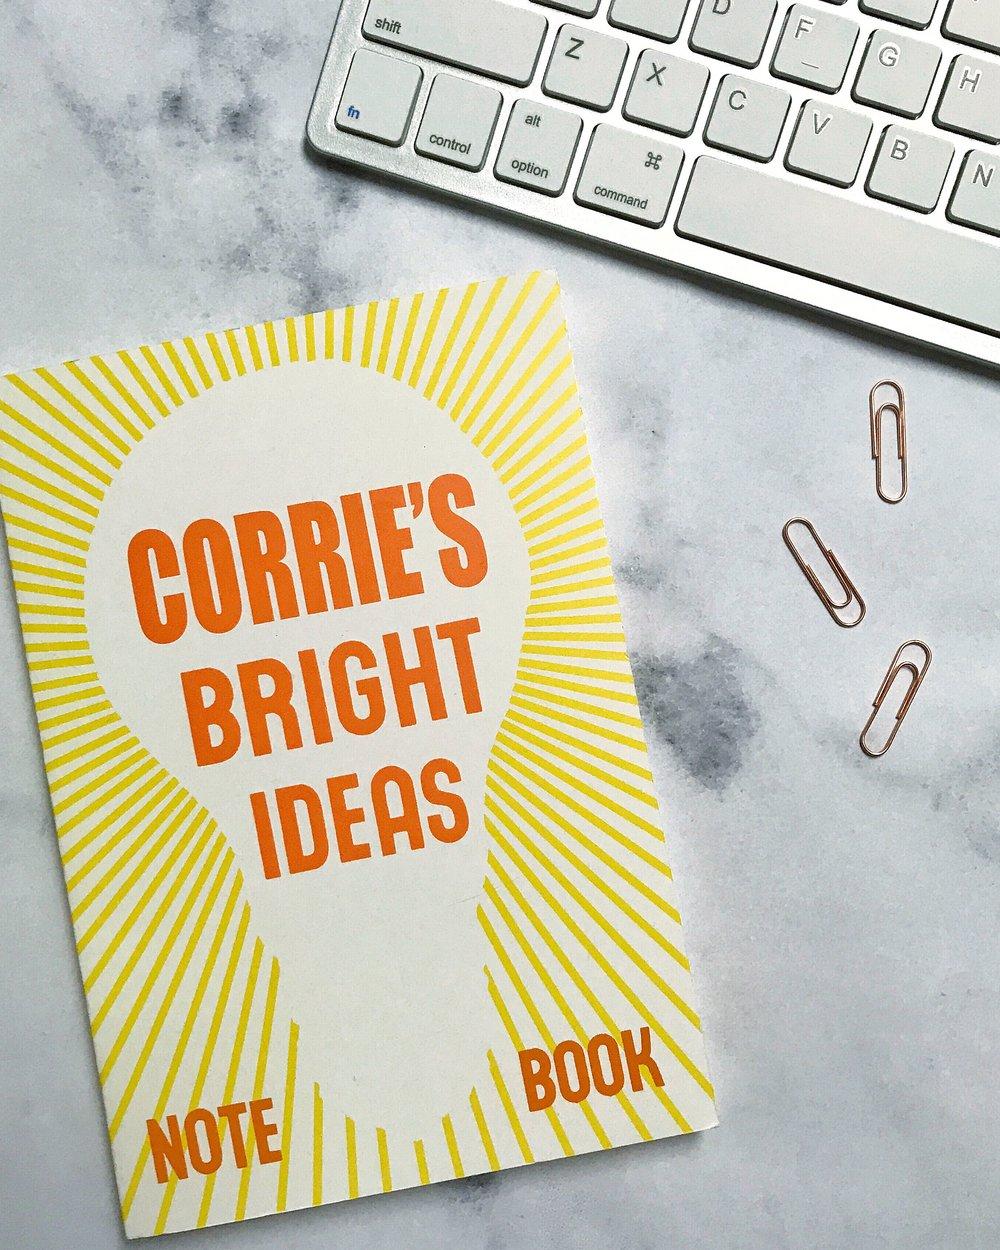 Corrie's bright ideas